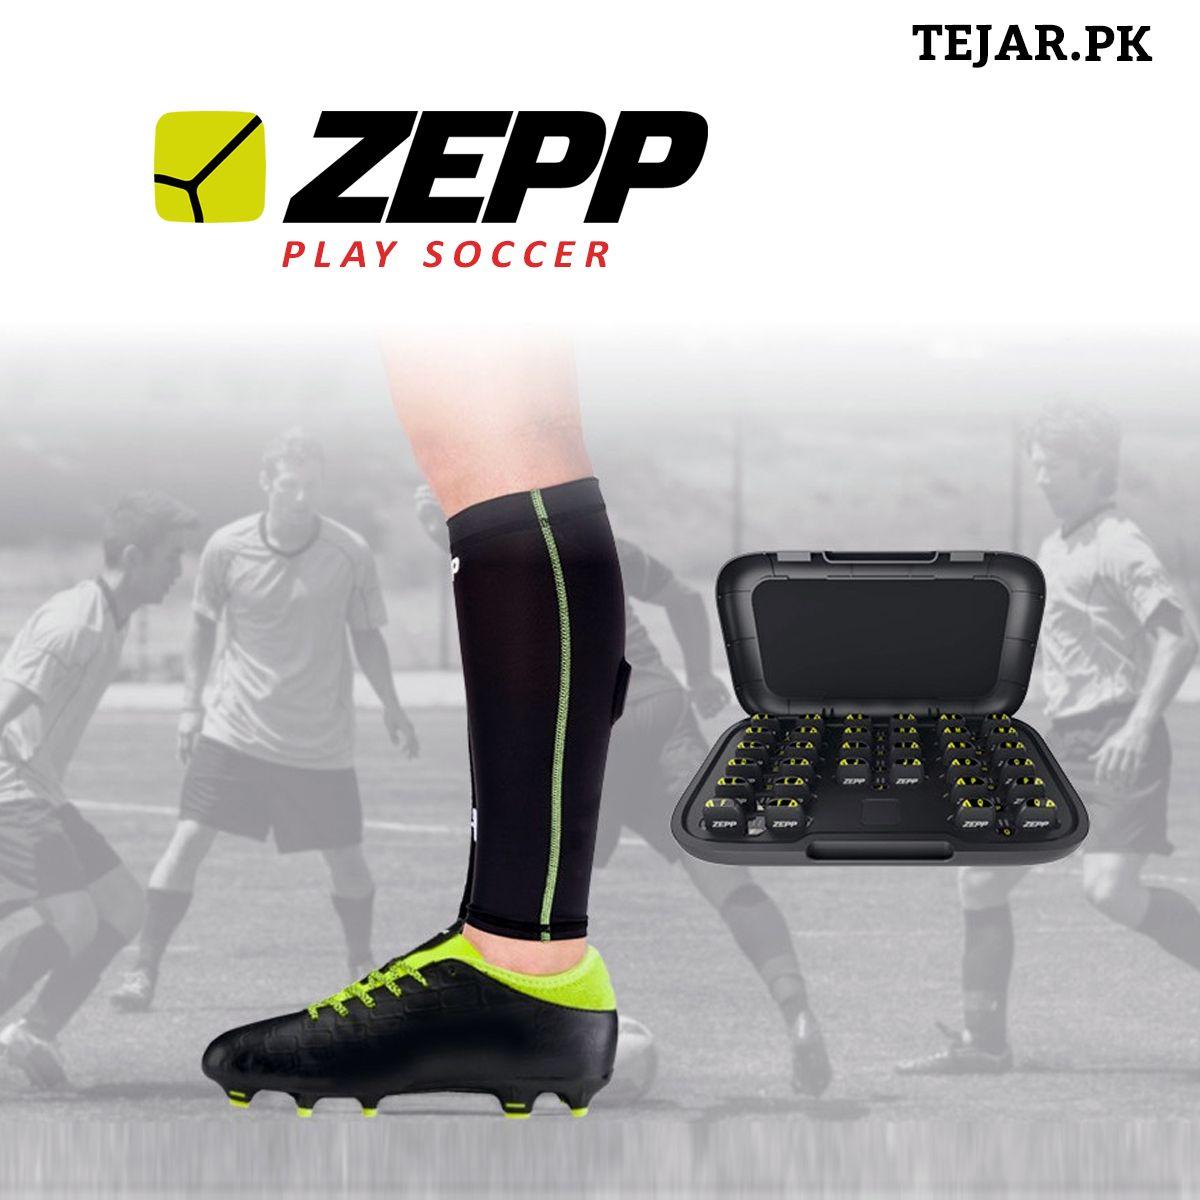 Zepp Play Soccer Team Edition Play soccer, Soccer team